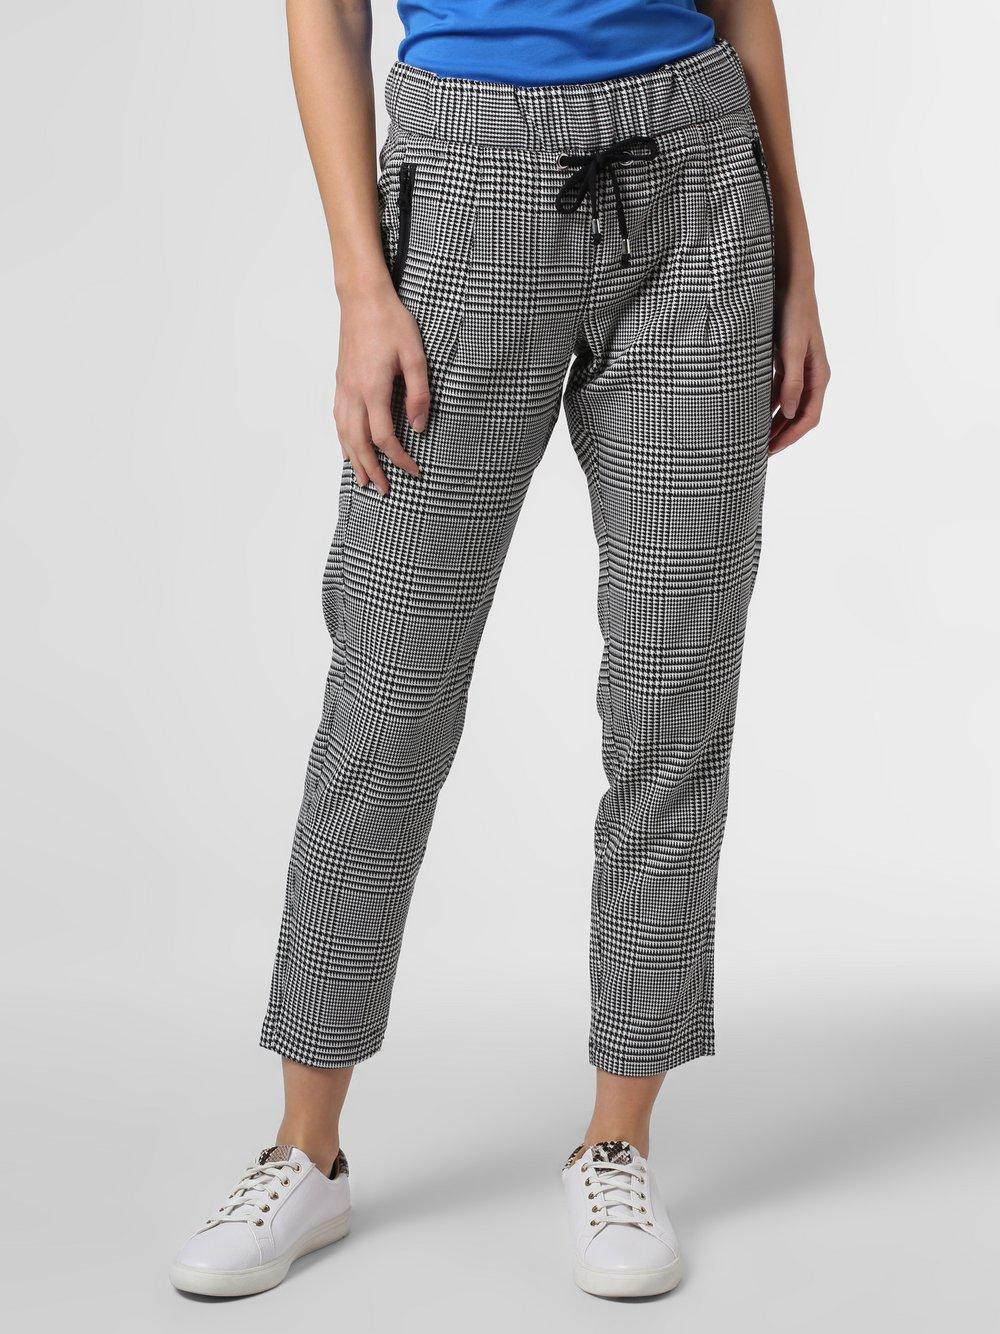 Olivia – Spodnie damskie, czarny Van Graaf 485275-0001-00420